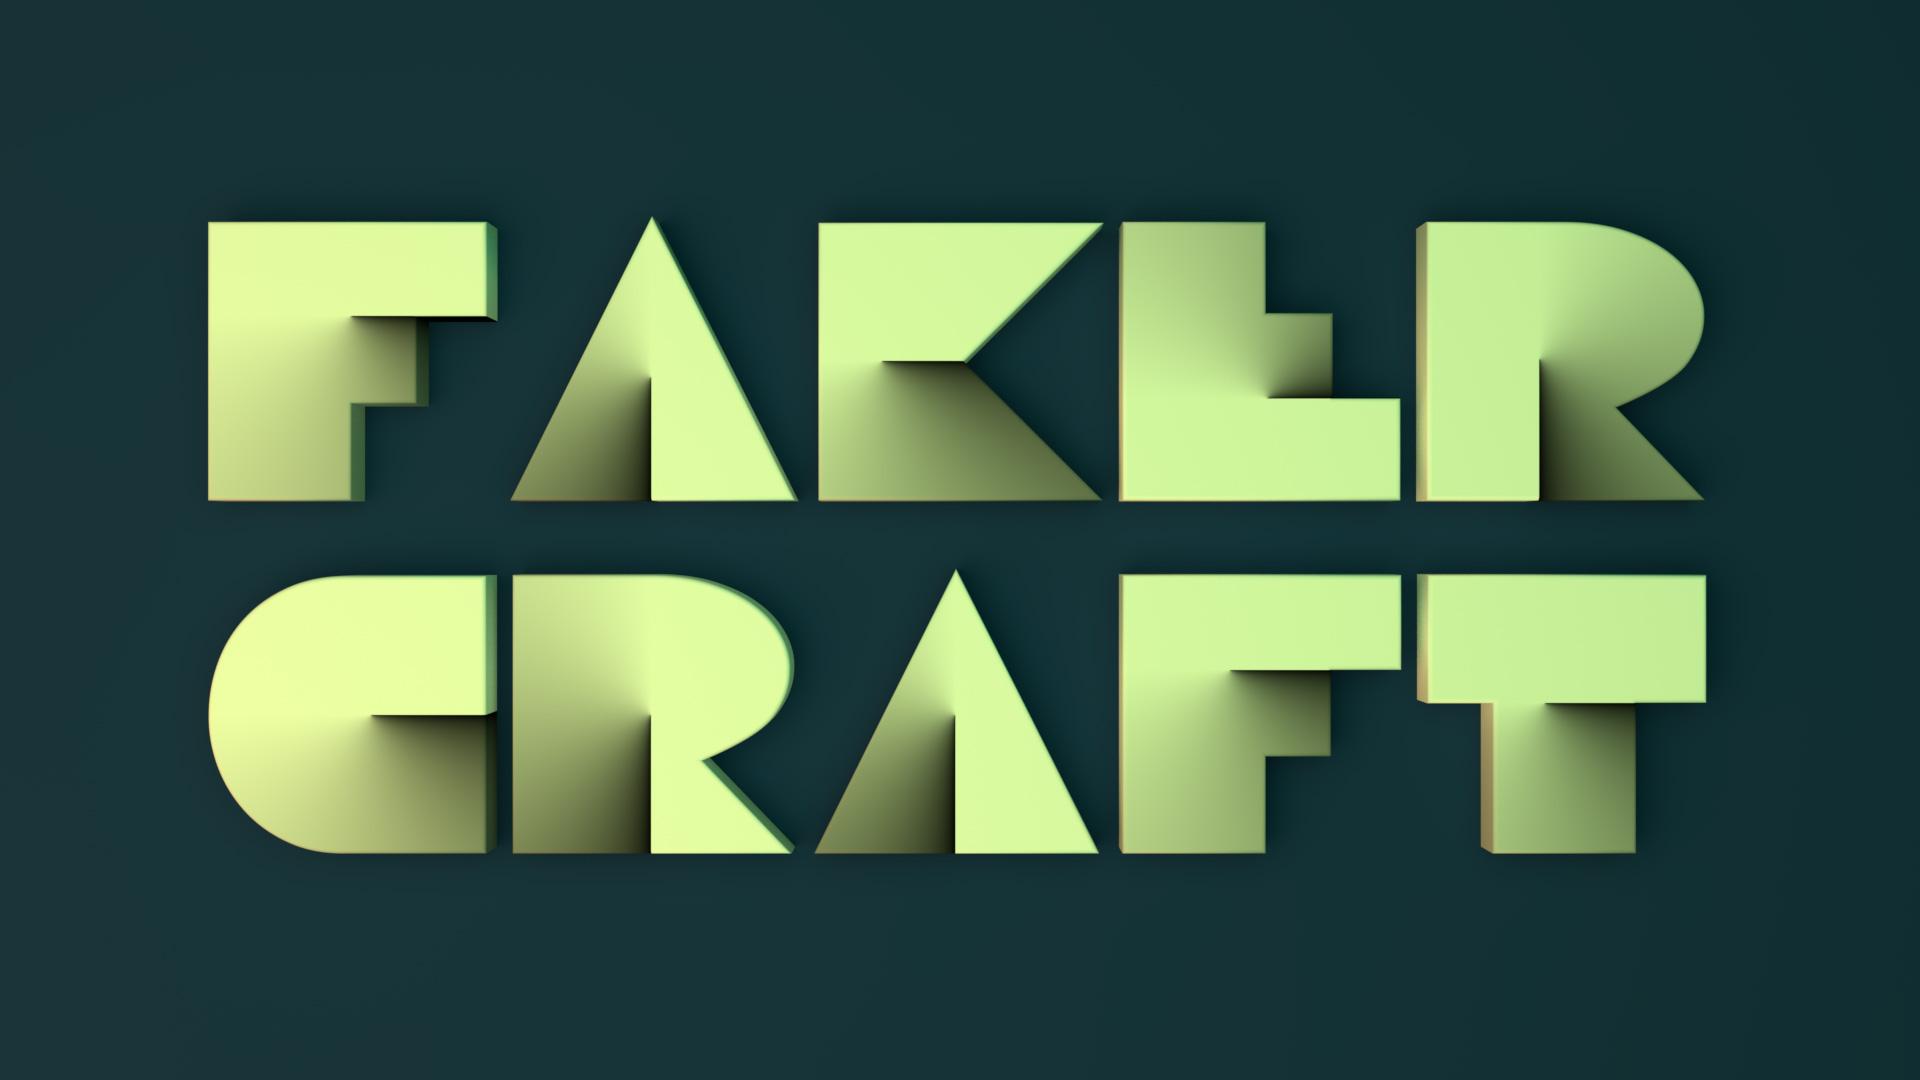 faker-craft